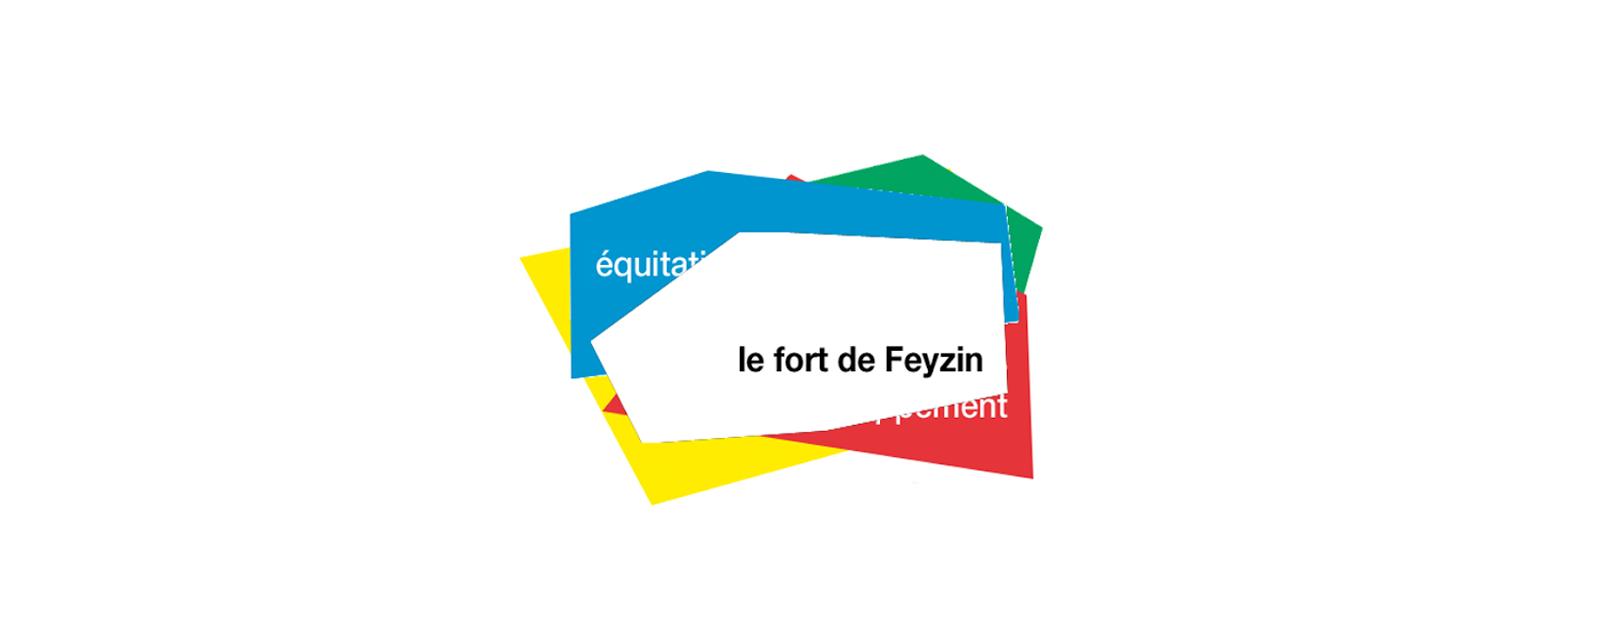 Le fort de Feyzin